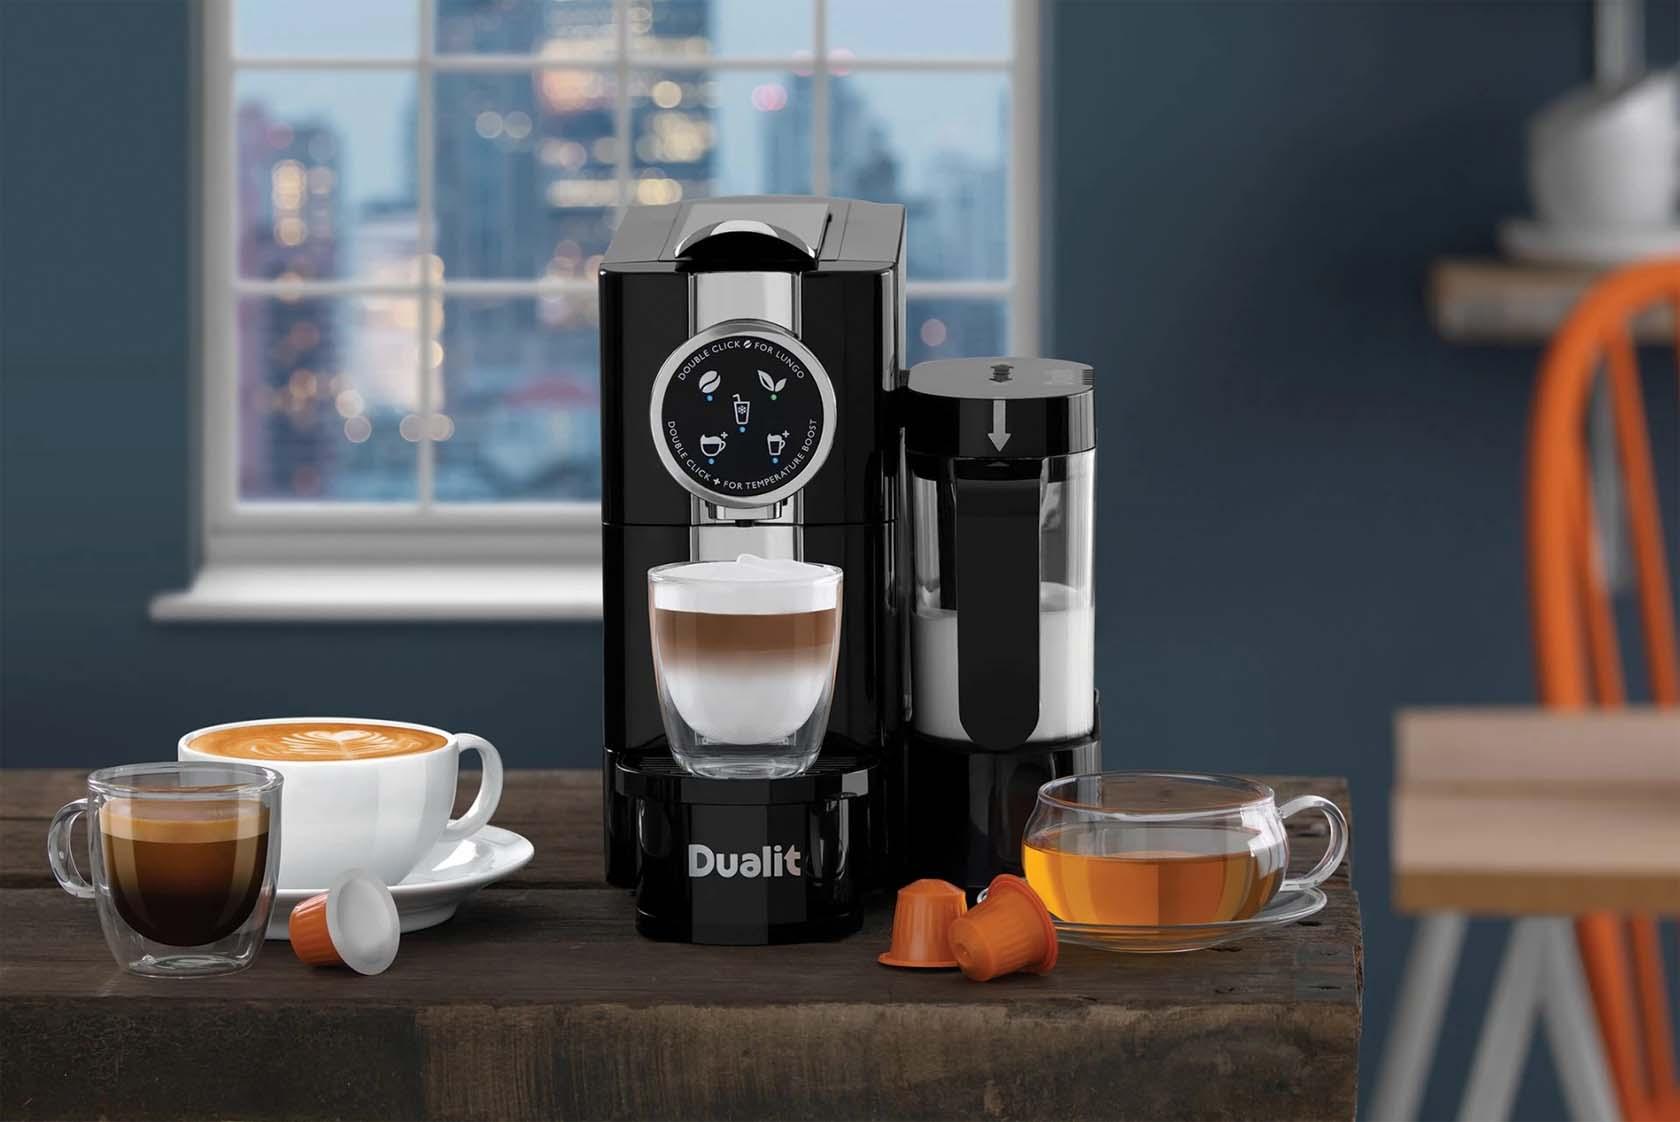 A Popup Platform For A Coffee Machine